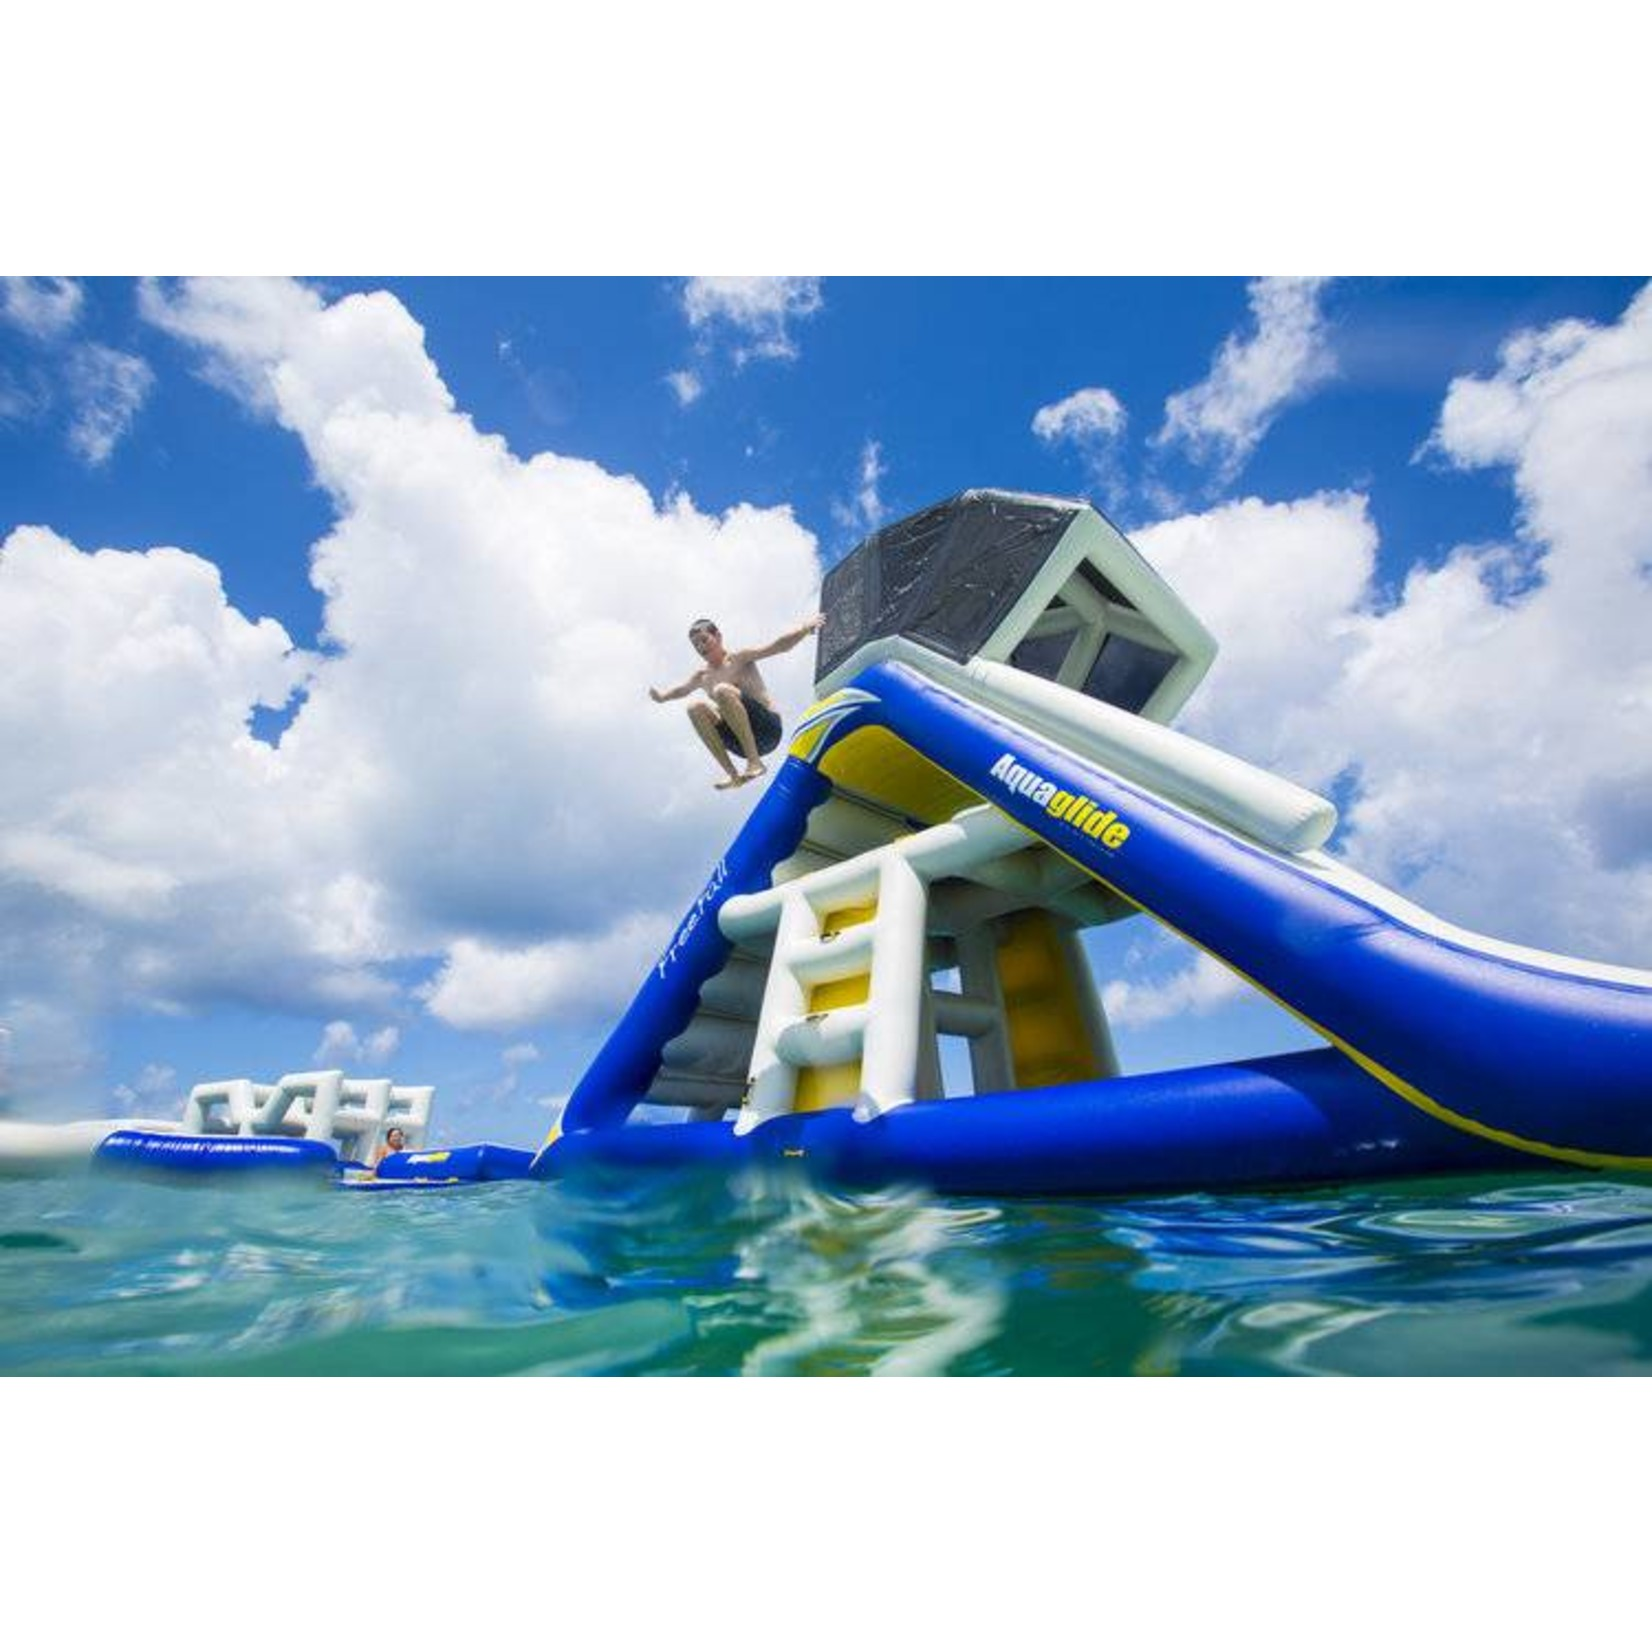 Aquaglide  Freefall Supreme - Climbing ladder